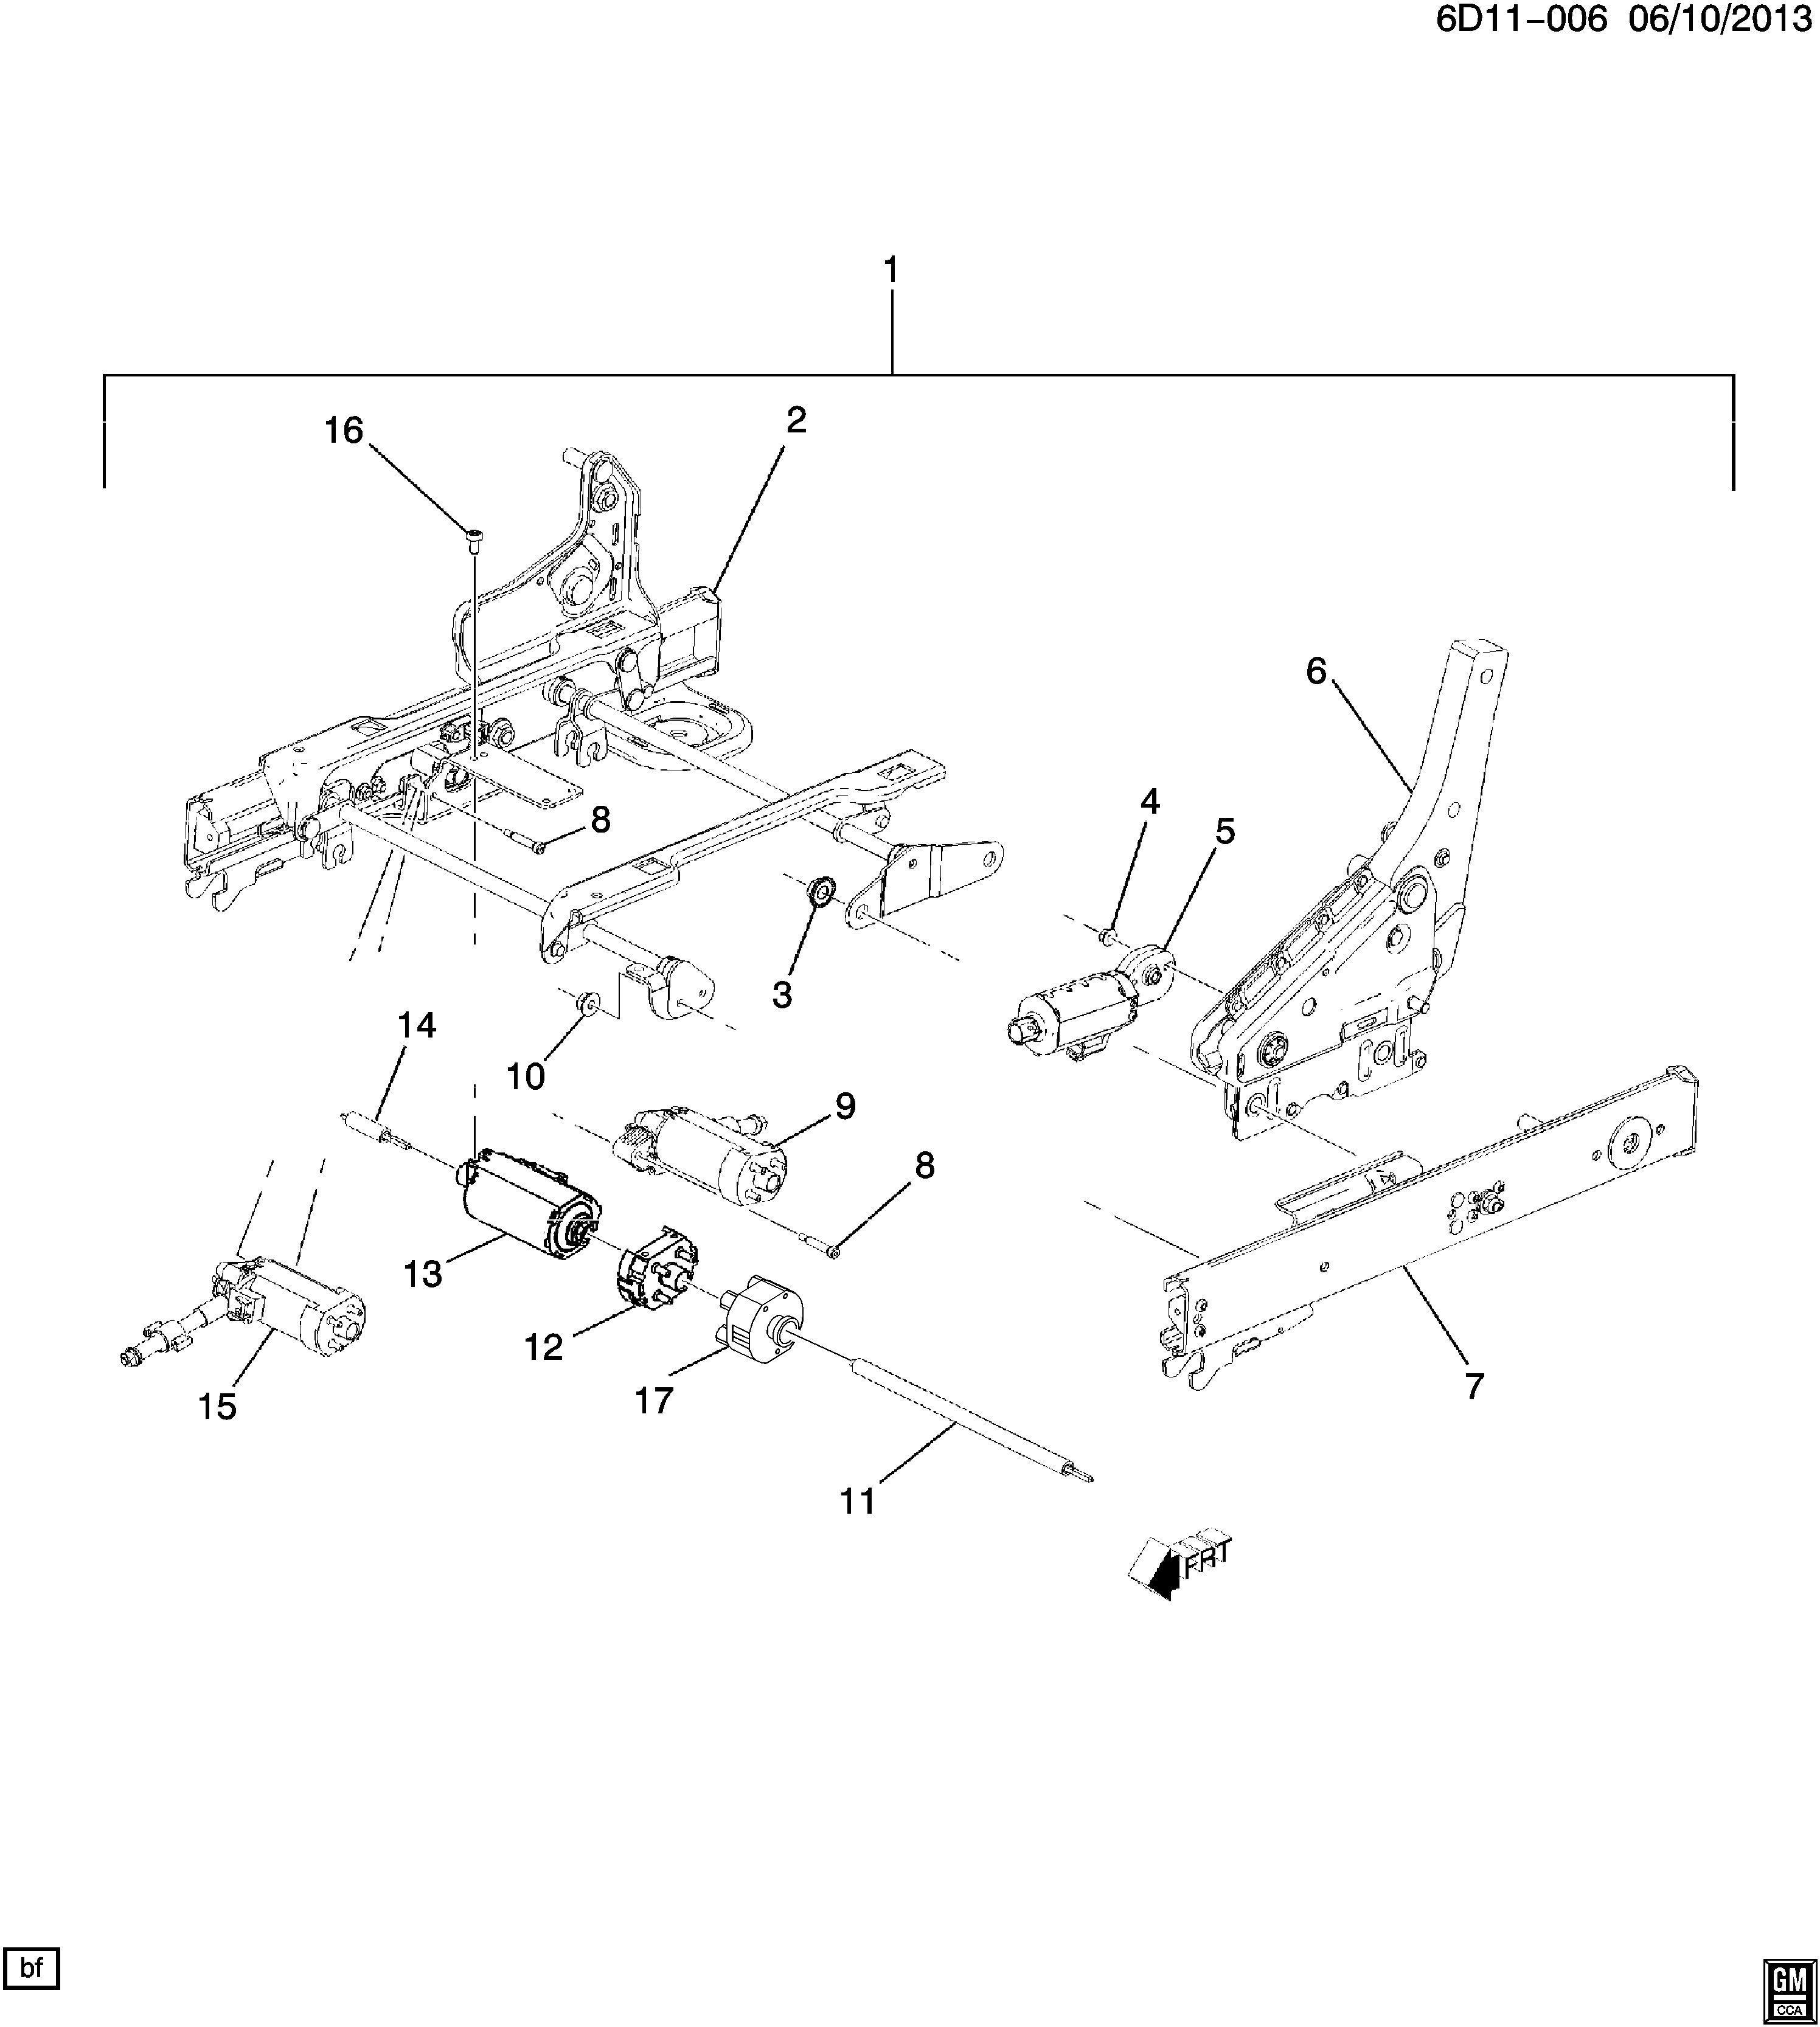 Cadillac Cts Motor Front Seat Adjuster